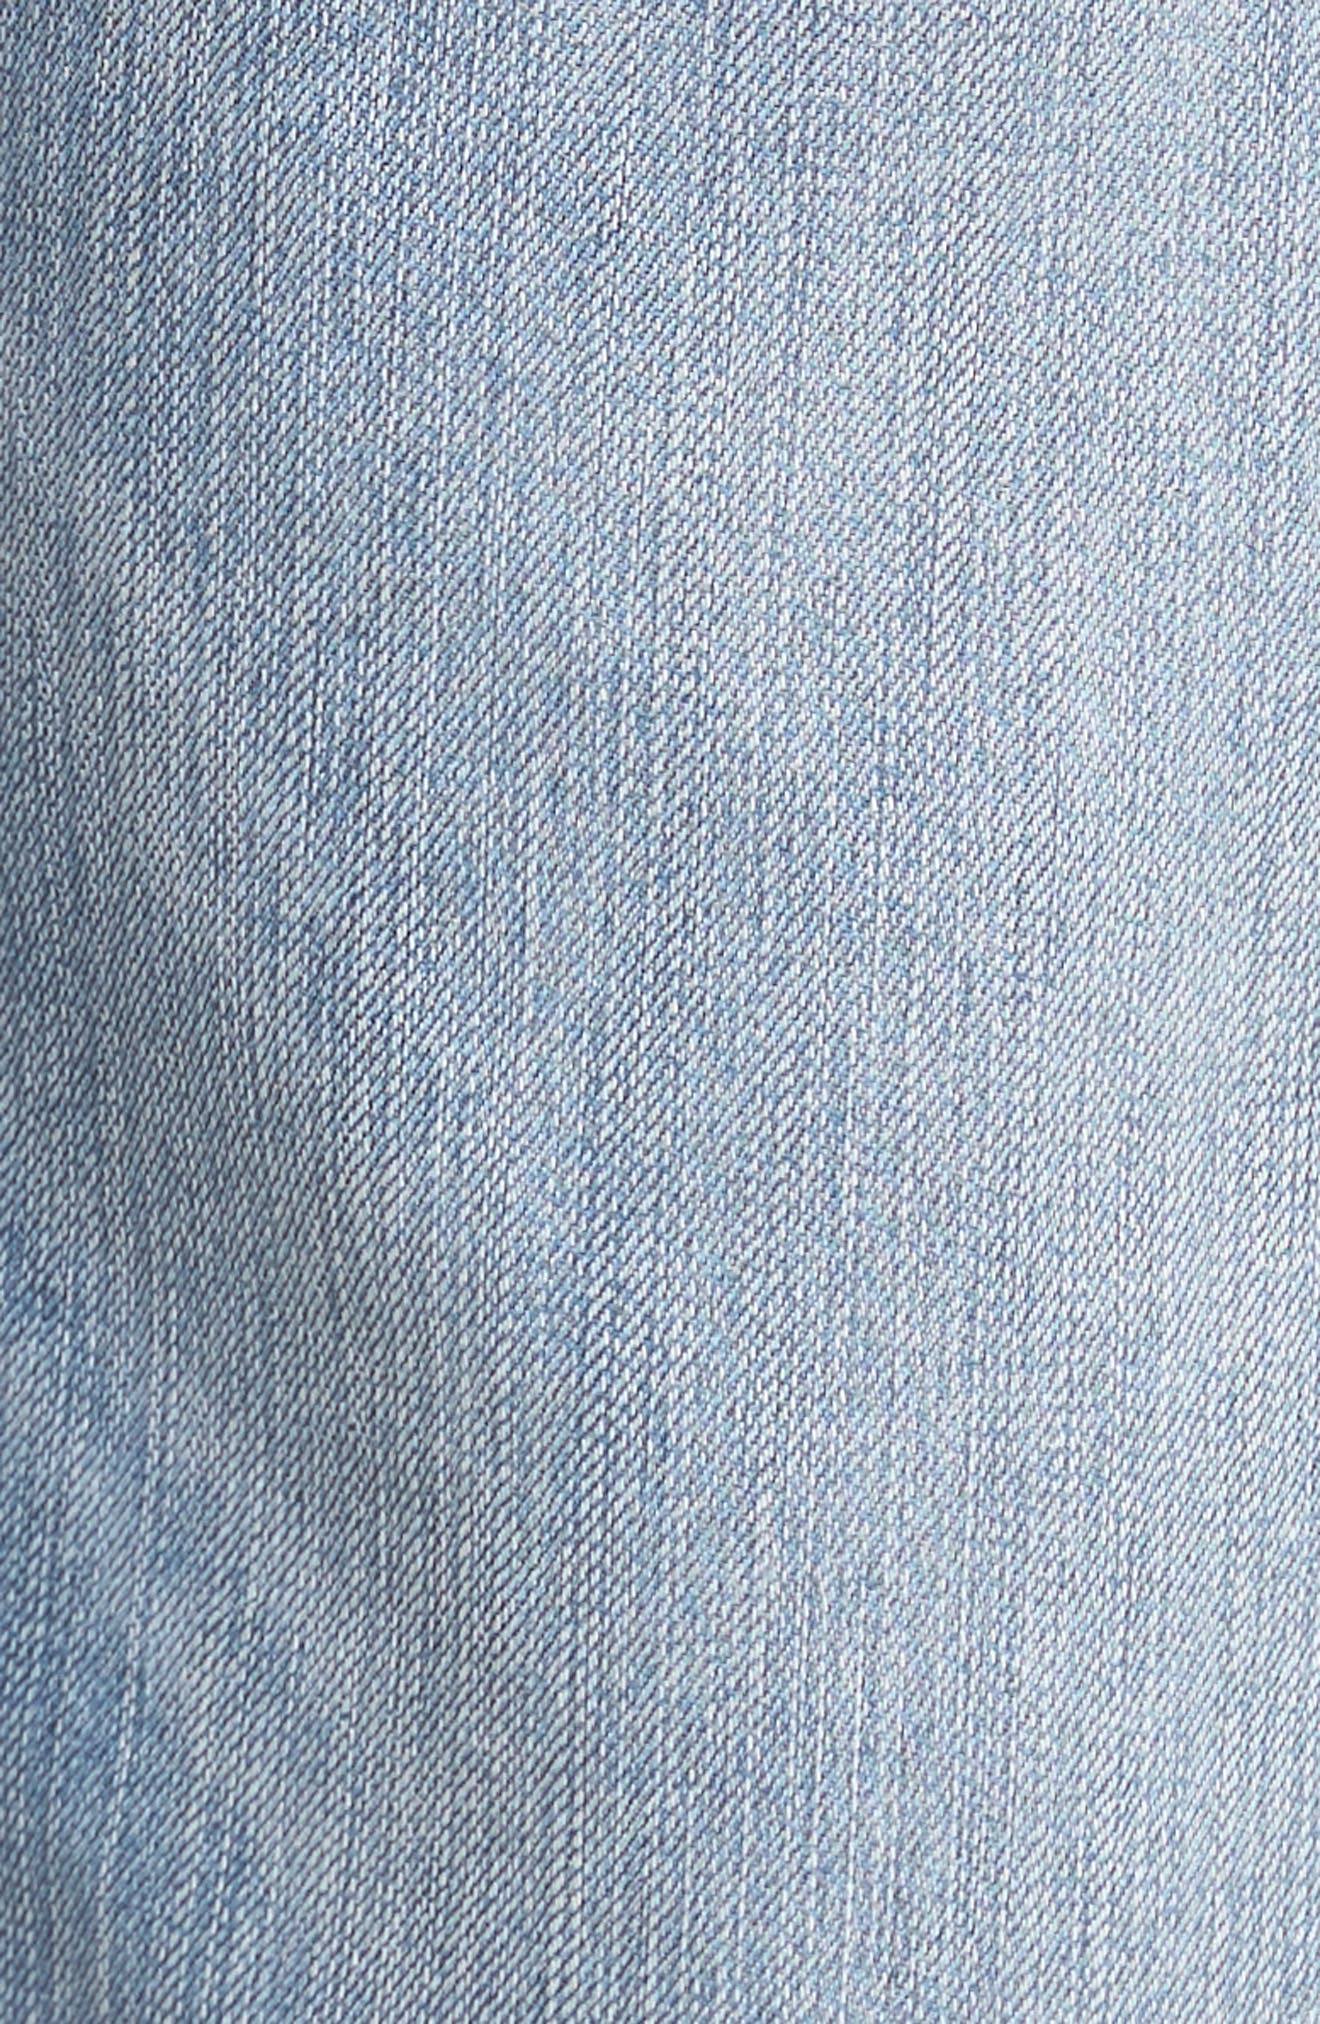 Sorrento Straight Leg Jeans,                             Alternate thumbnail 5, color,                             Light Wash